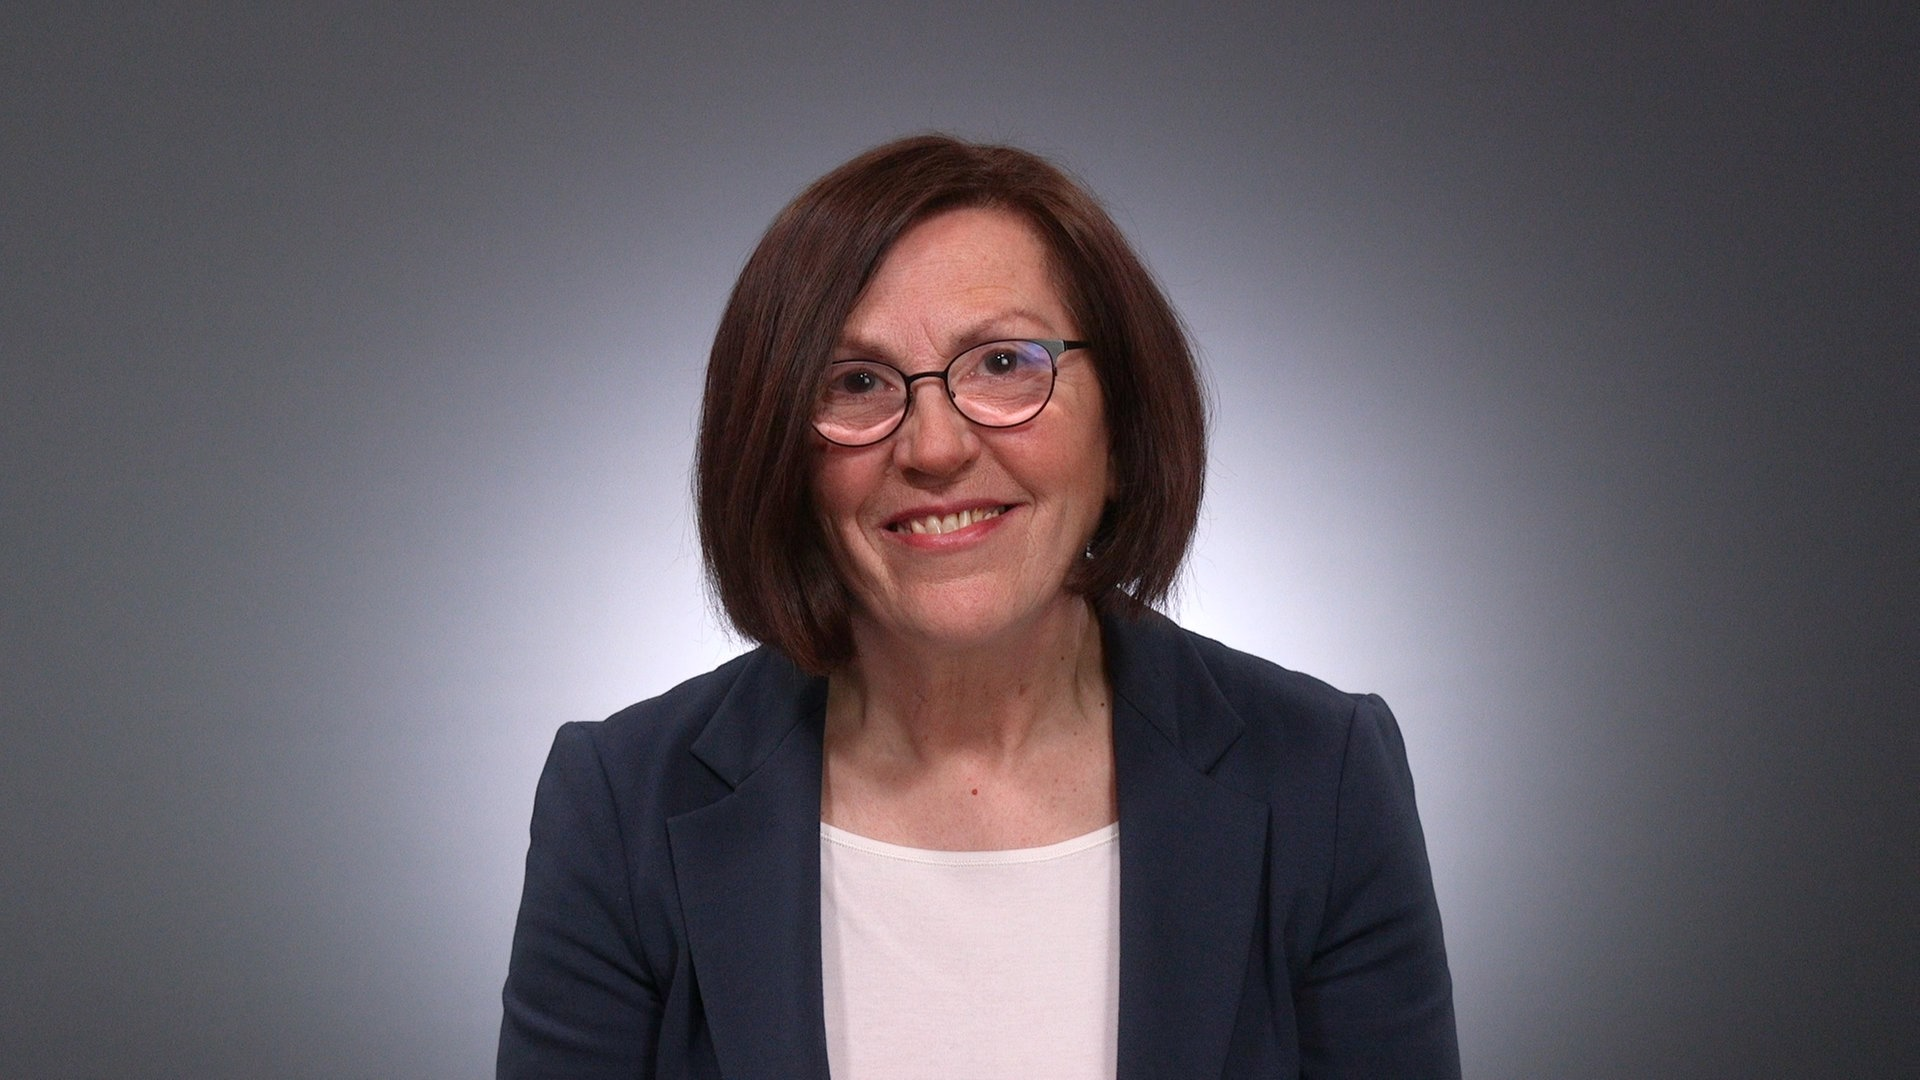 Regina-Elisabeth Jäck, SPD